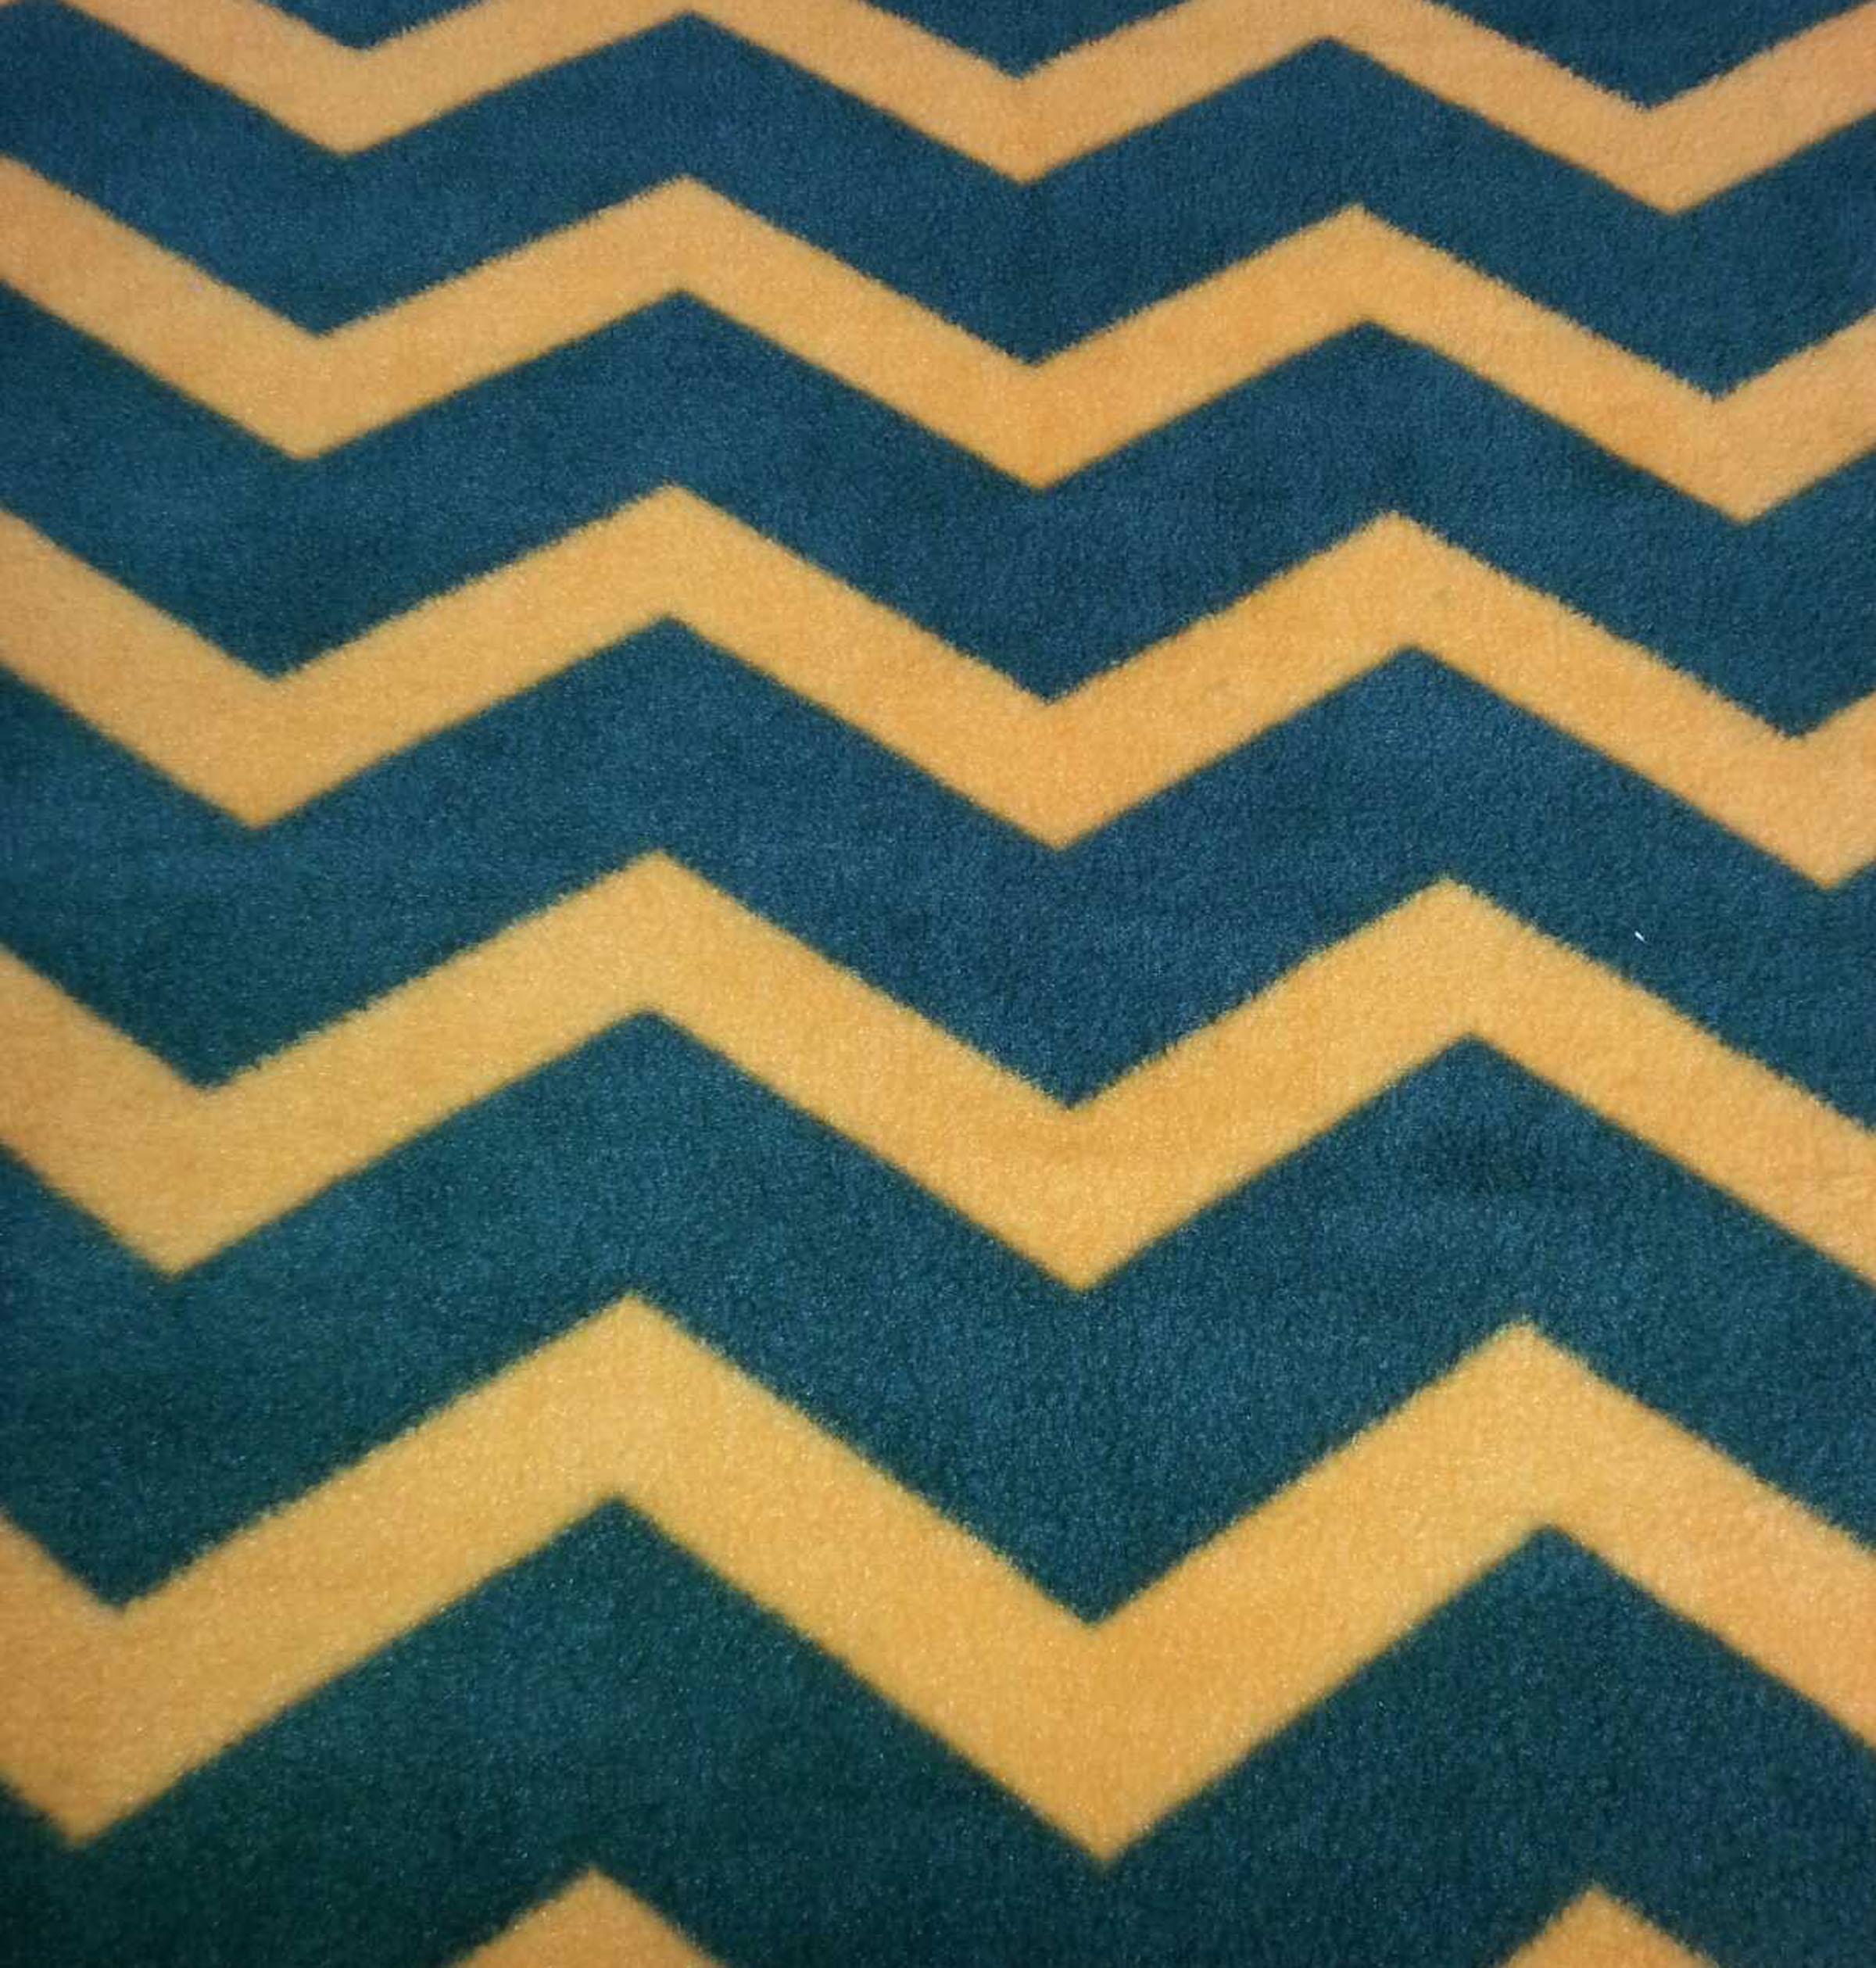 Anti Pill Fleece Fabric- Green & Gold Chevron | JOANN